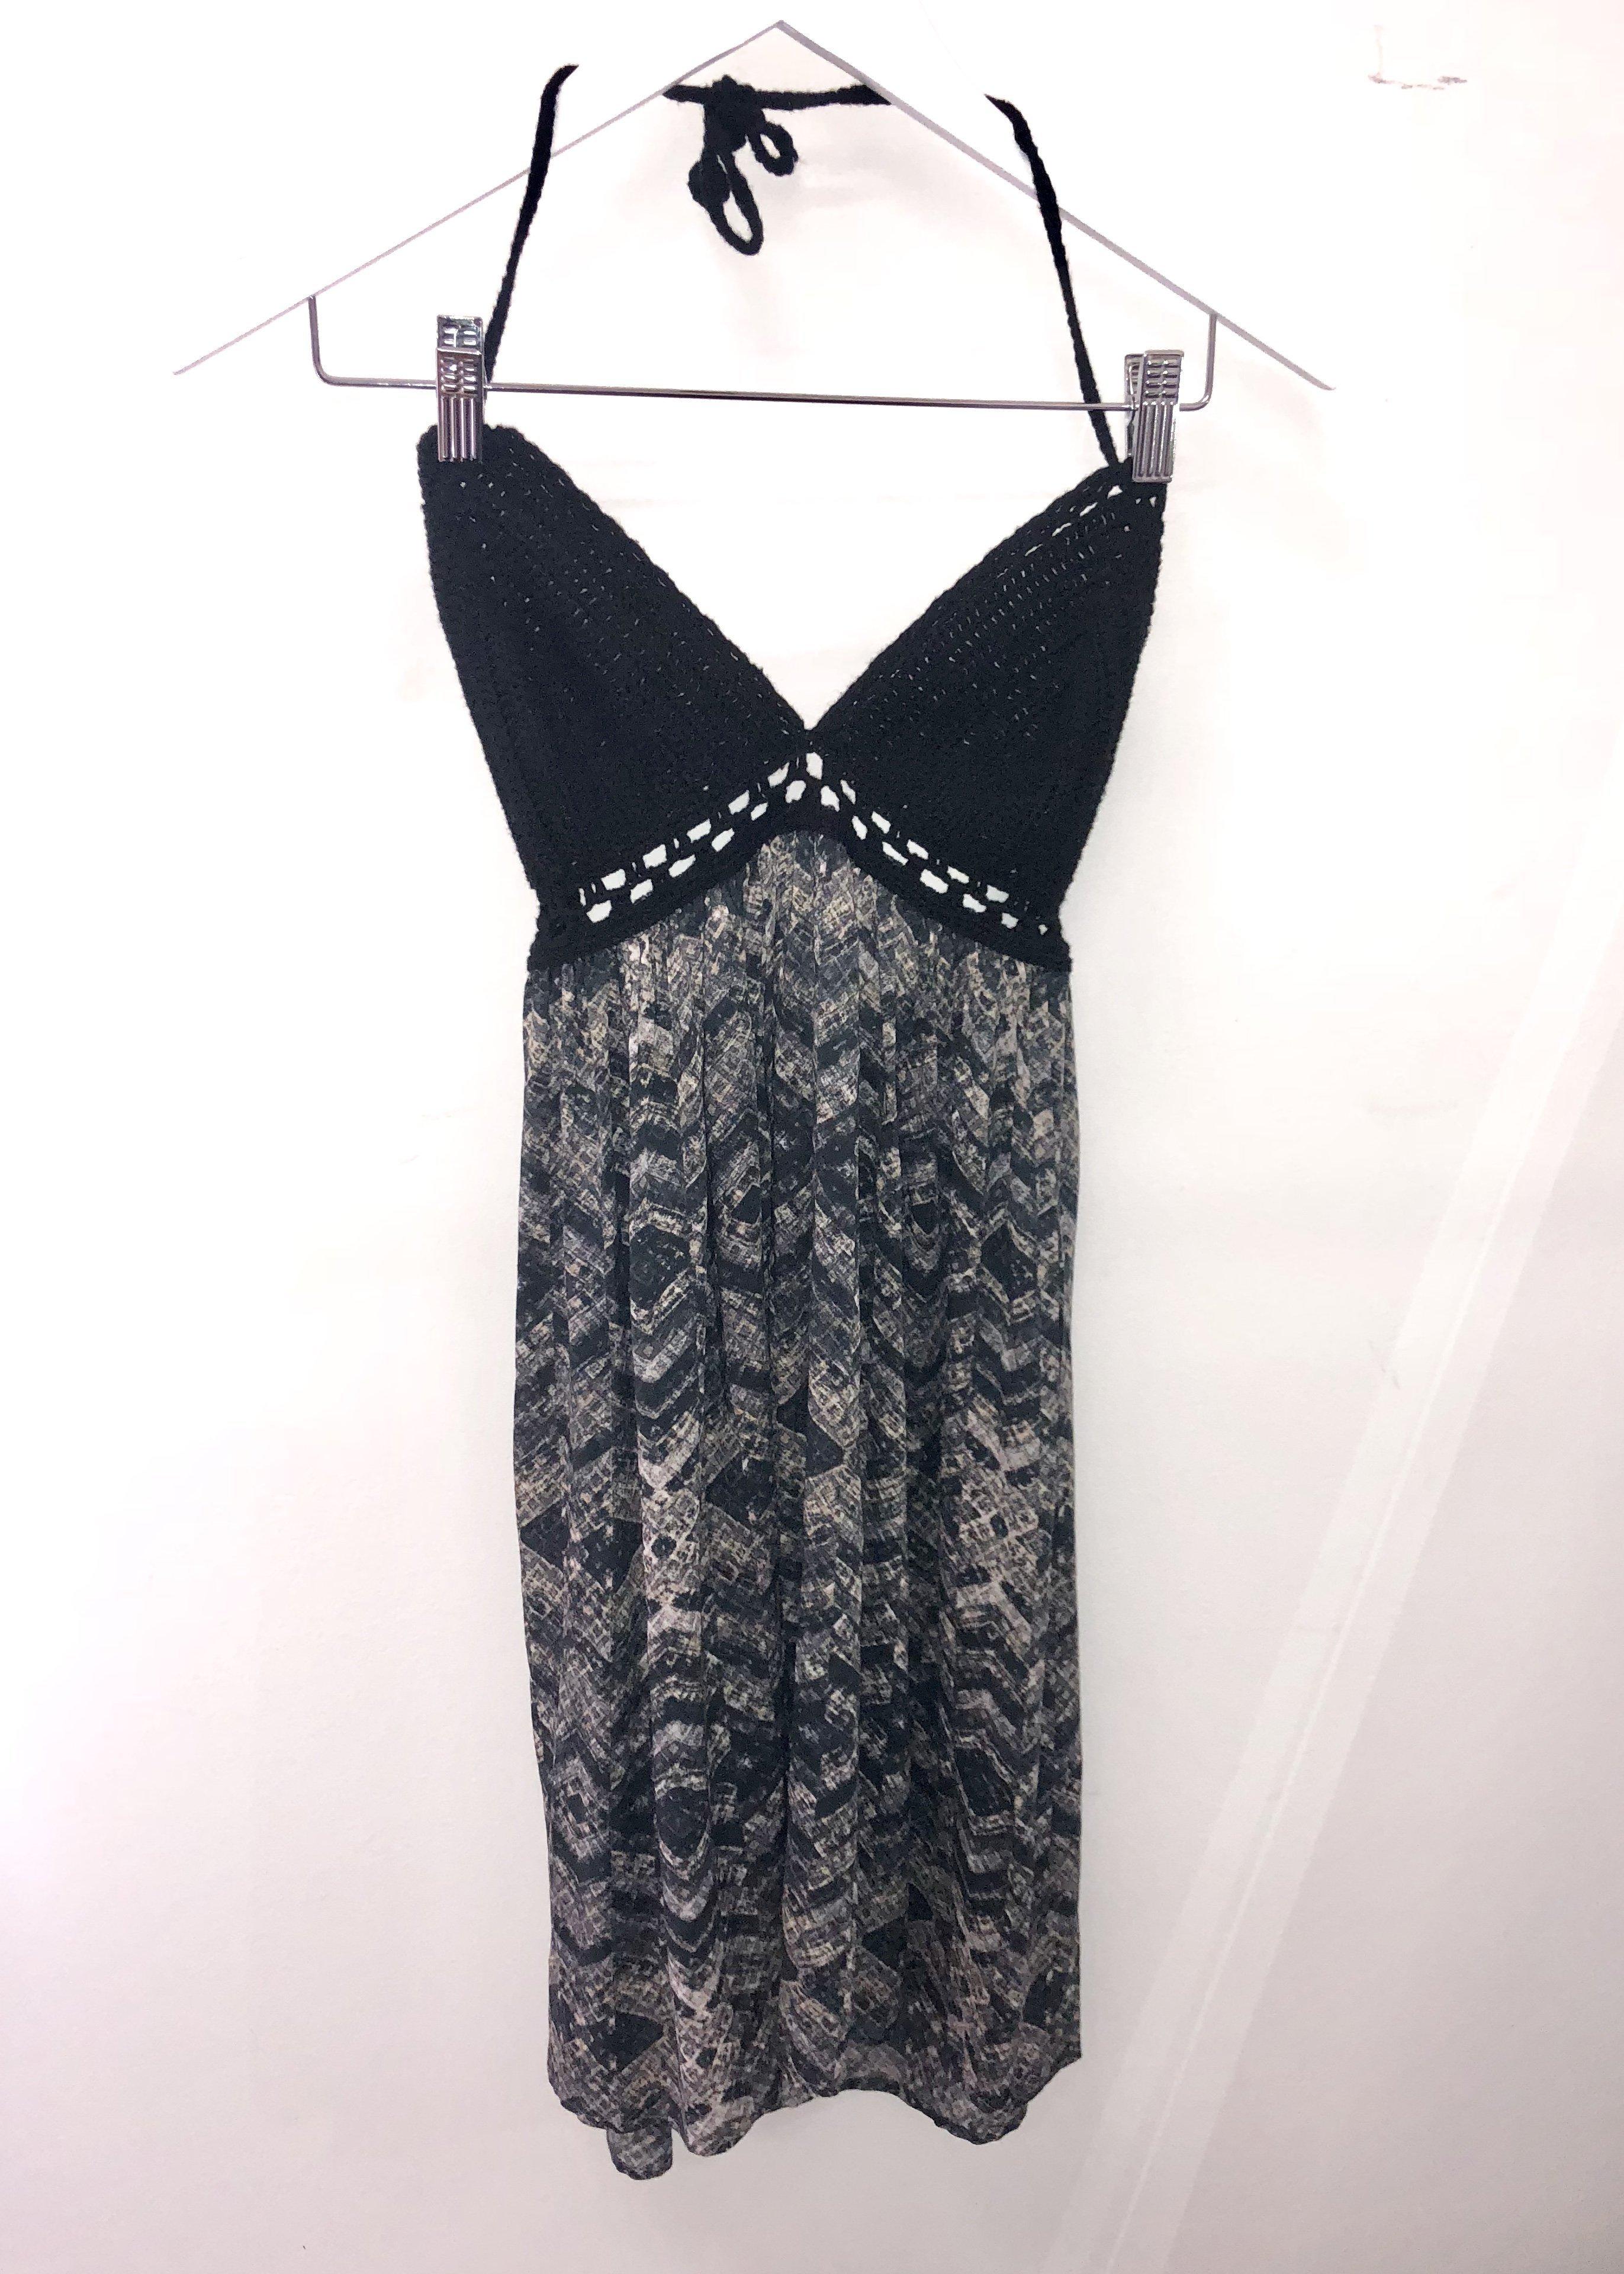 Poema Swim - Oahu Dress - S/M - SAMPLE